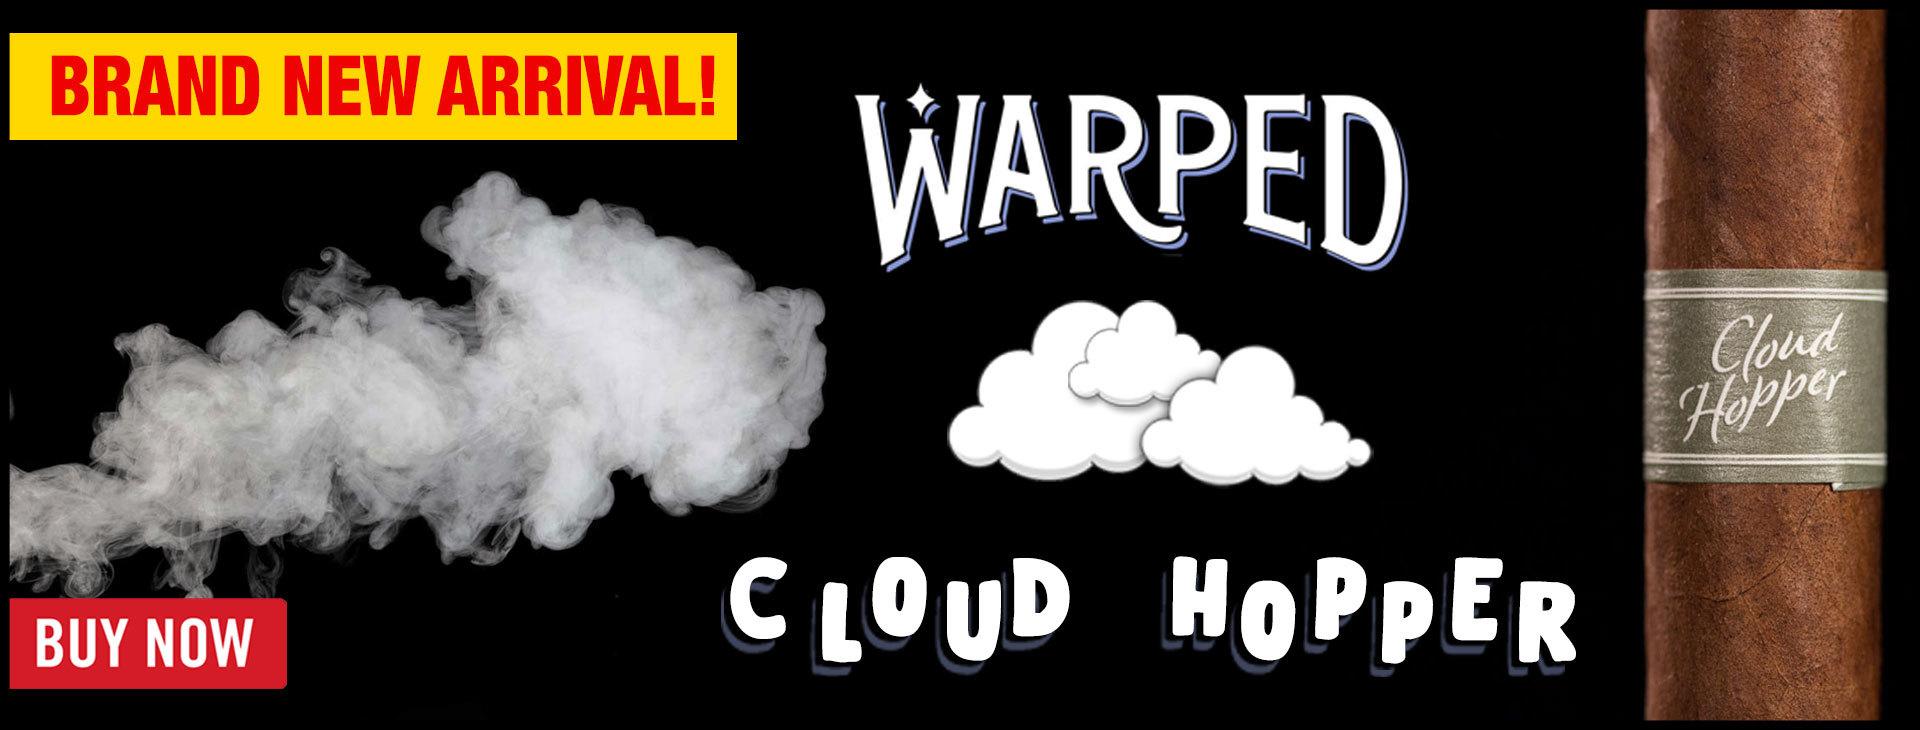 NEW ARRIVAL: Warped Cloud Hopper!